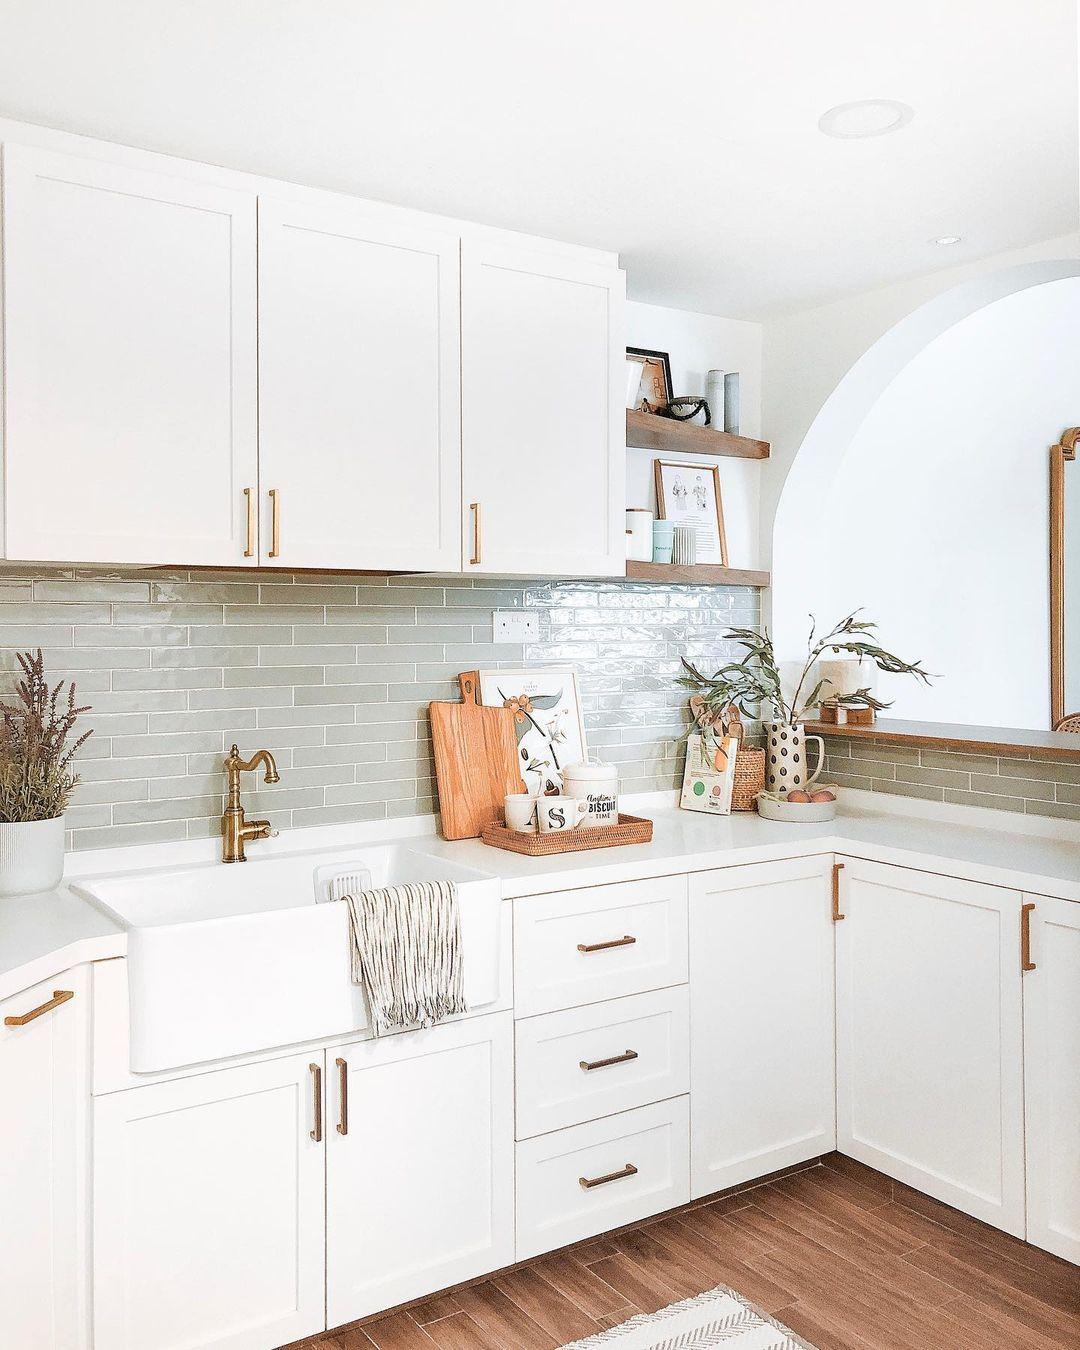 16 Backsplash Ideas Perfect For White Kitchens